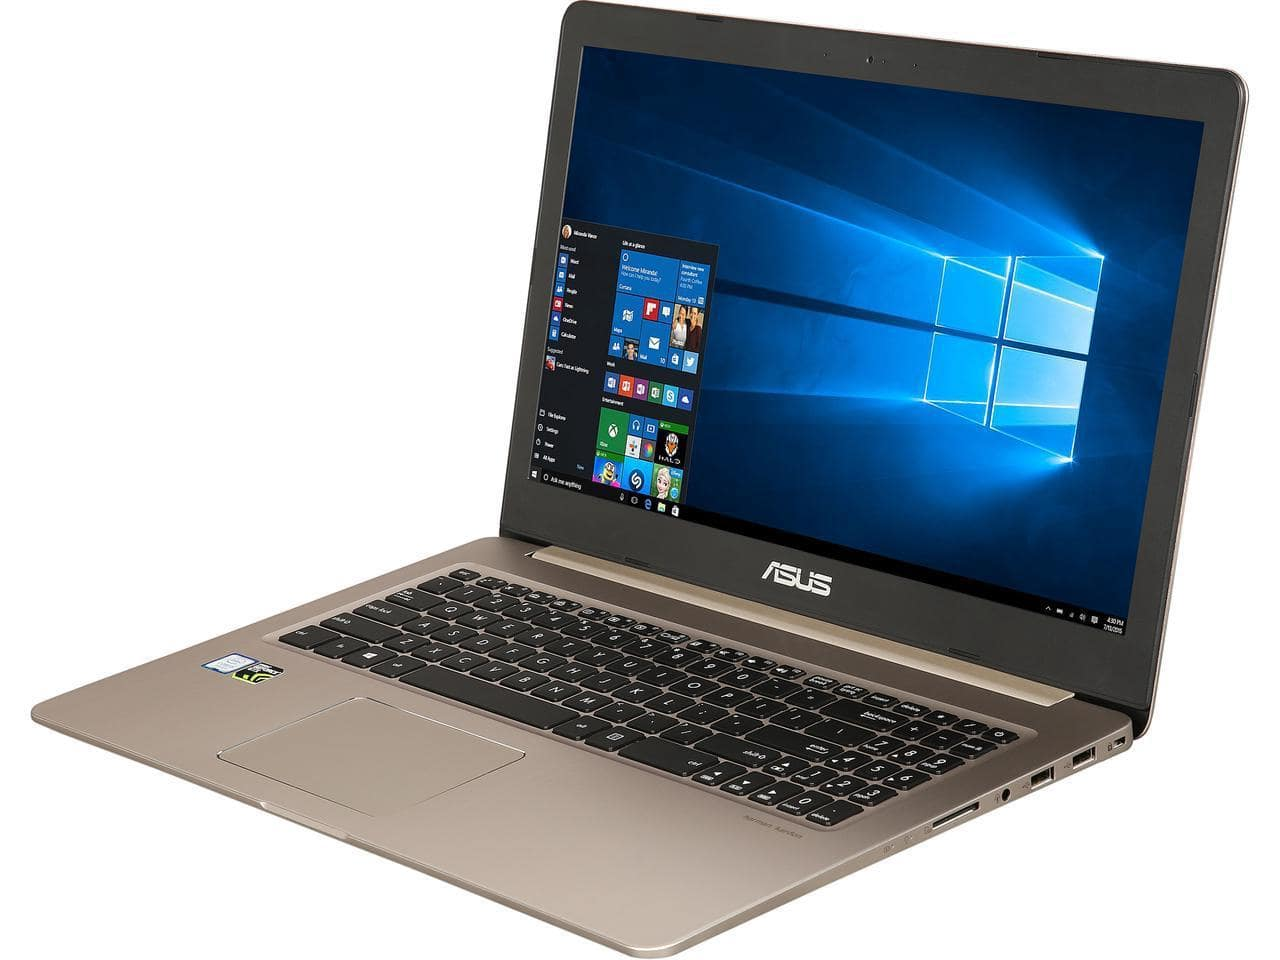 ASUS VivoBook M580VD-EB54 Ultrathin Laptop: 15.6'' FHD, i5-7300HQ, 8GB DDR4, 256GB SSD, GTX 1050 2GB, WIn10H @ $639 AR + F/S